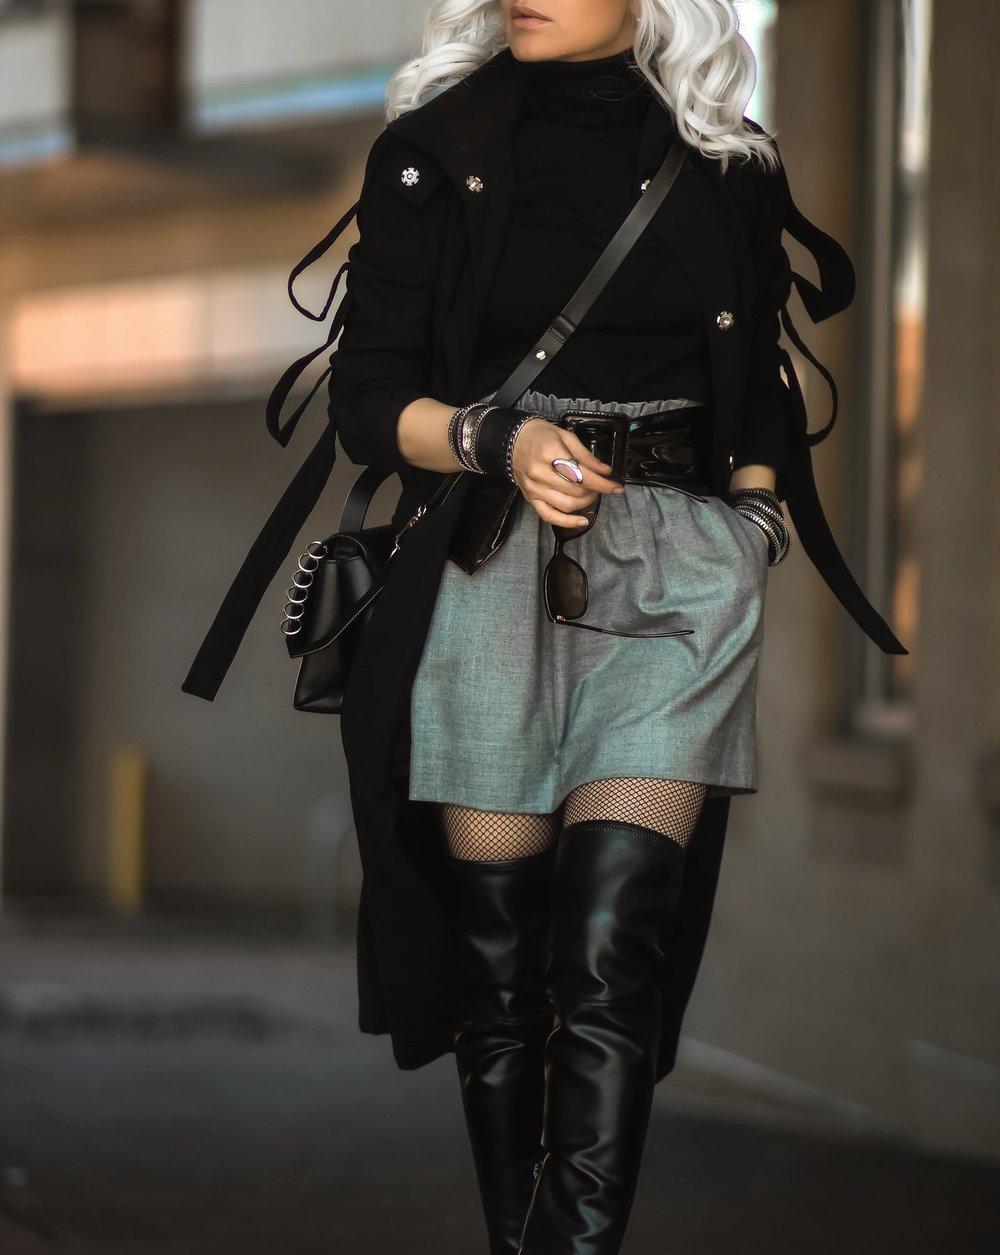 Isabel-Alexander-Atomic-Blonde-Haloween-outfit-Calvin-Klein-thigh-high-boots